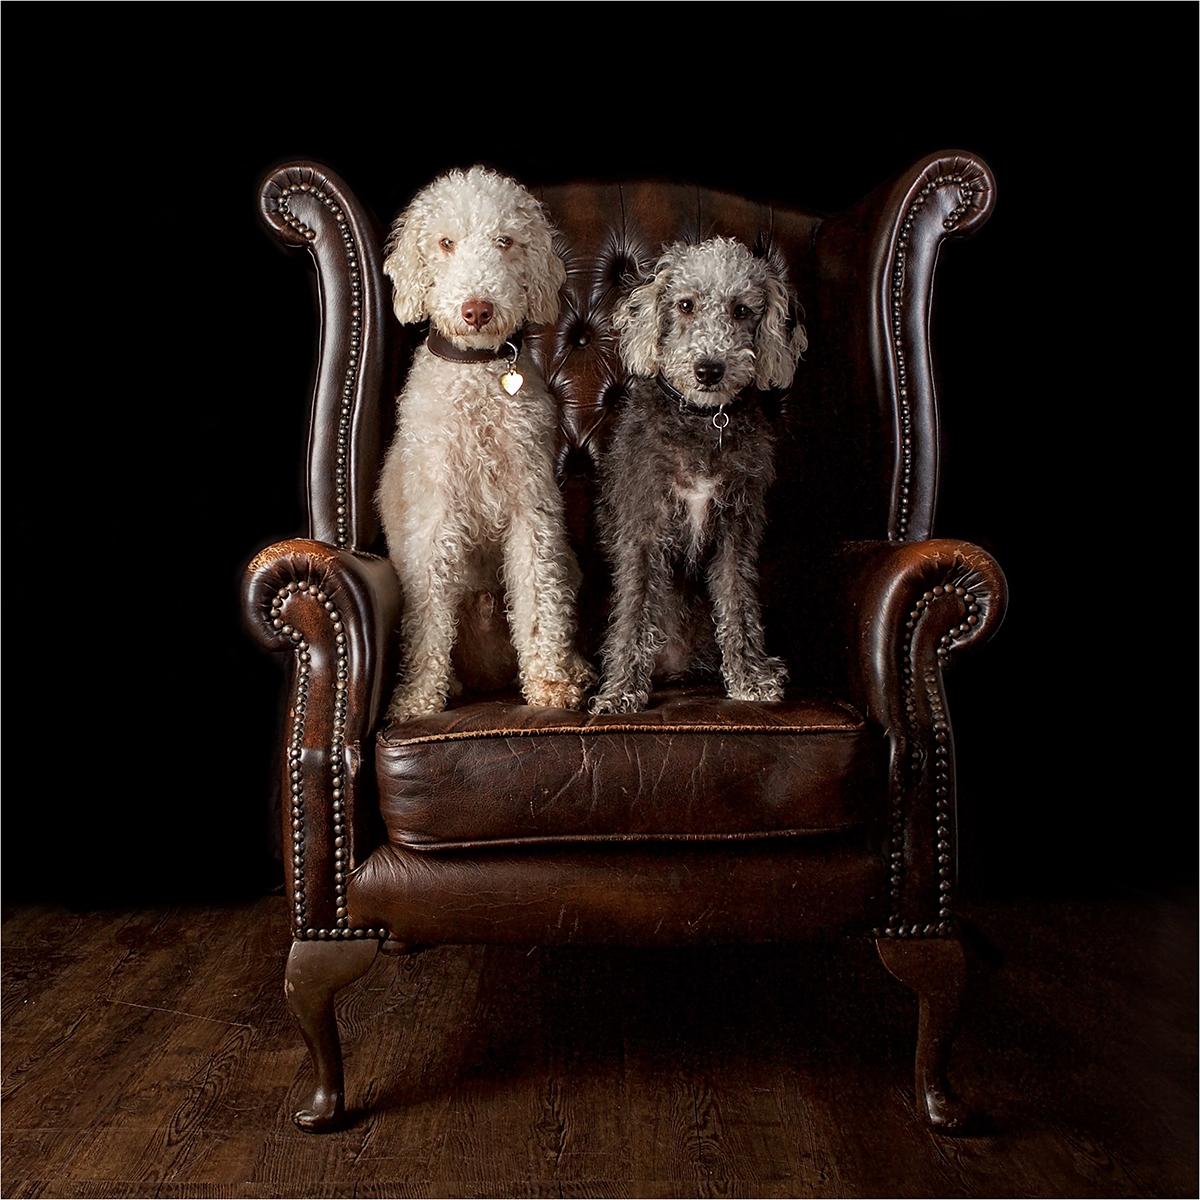 Barney and Bertie © Catherine Dashwood